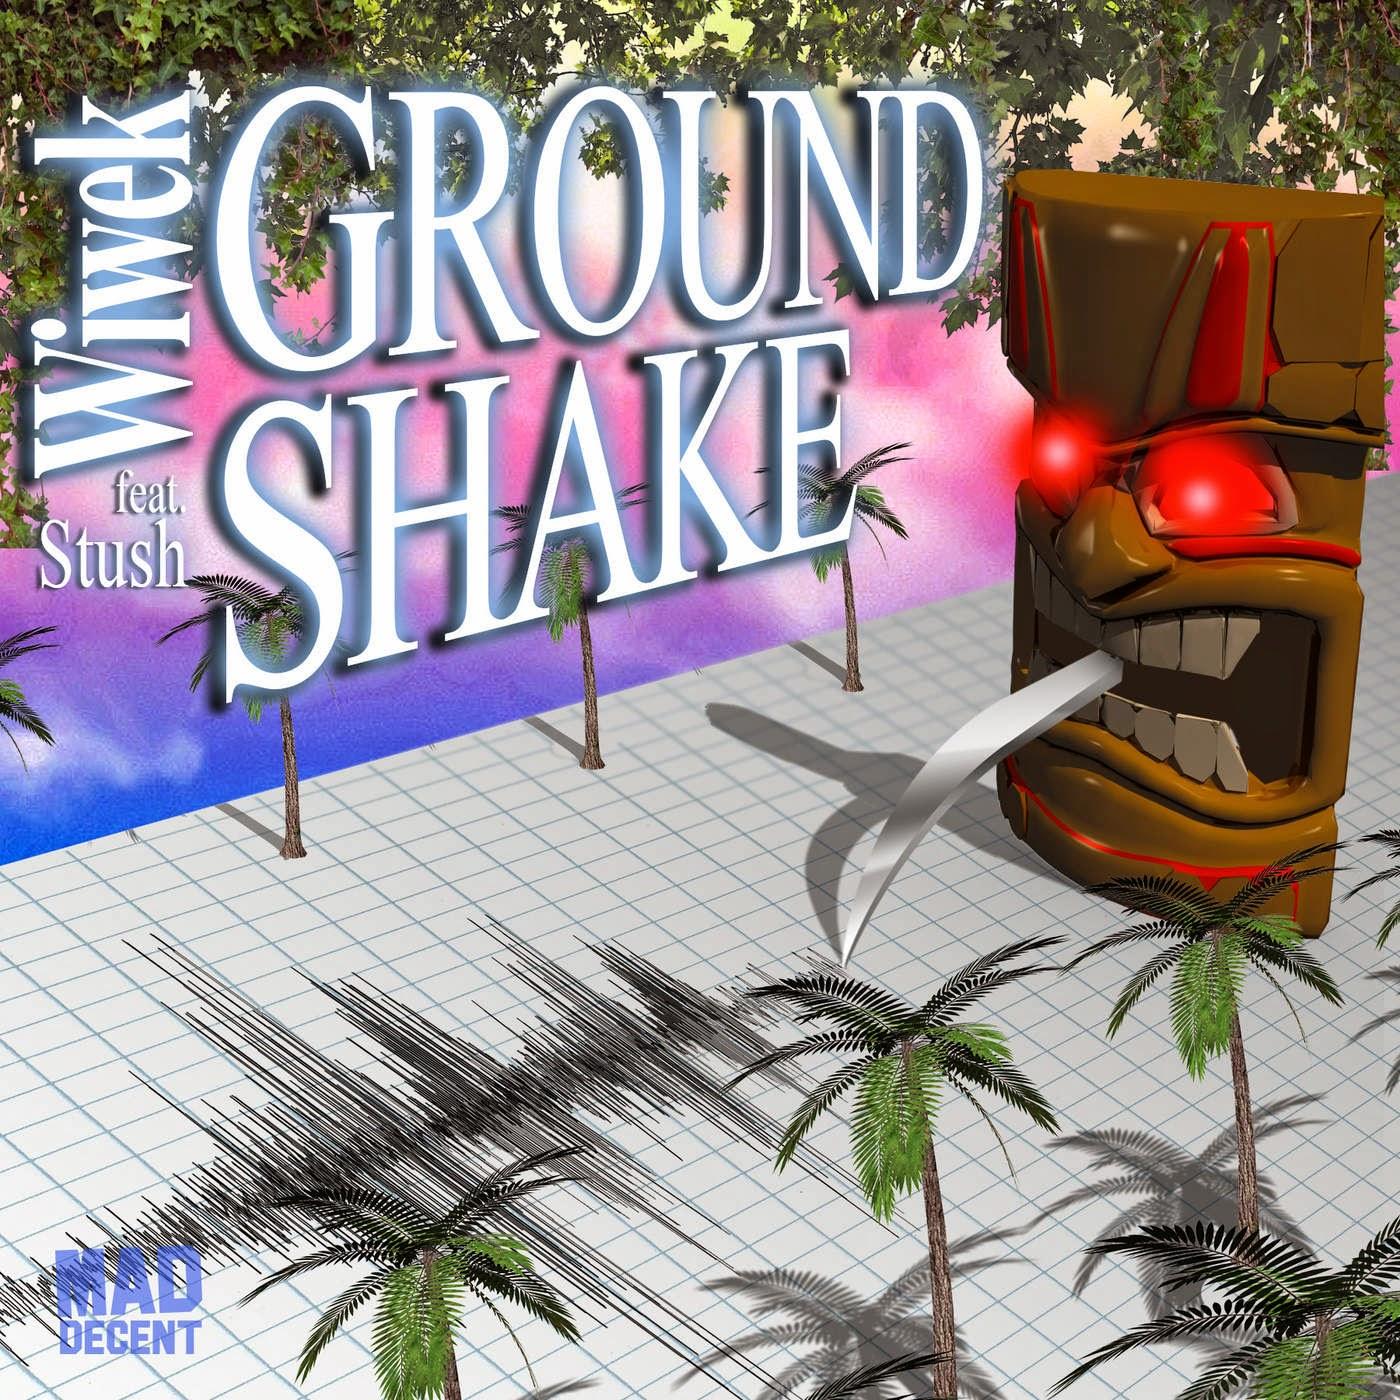 Wiwek - Ground Shake (feat. Stush) - Single  Cover